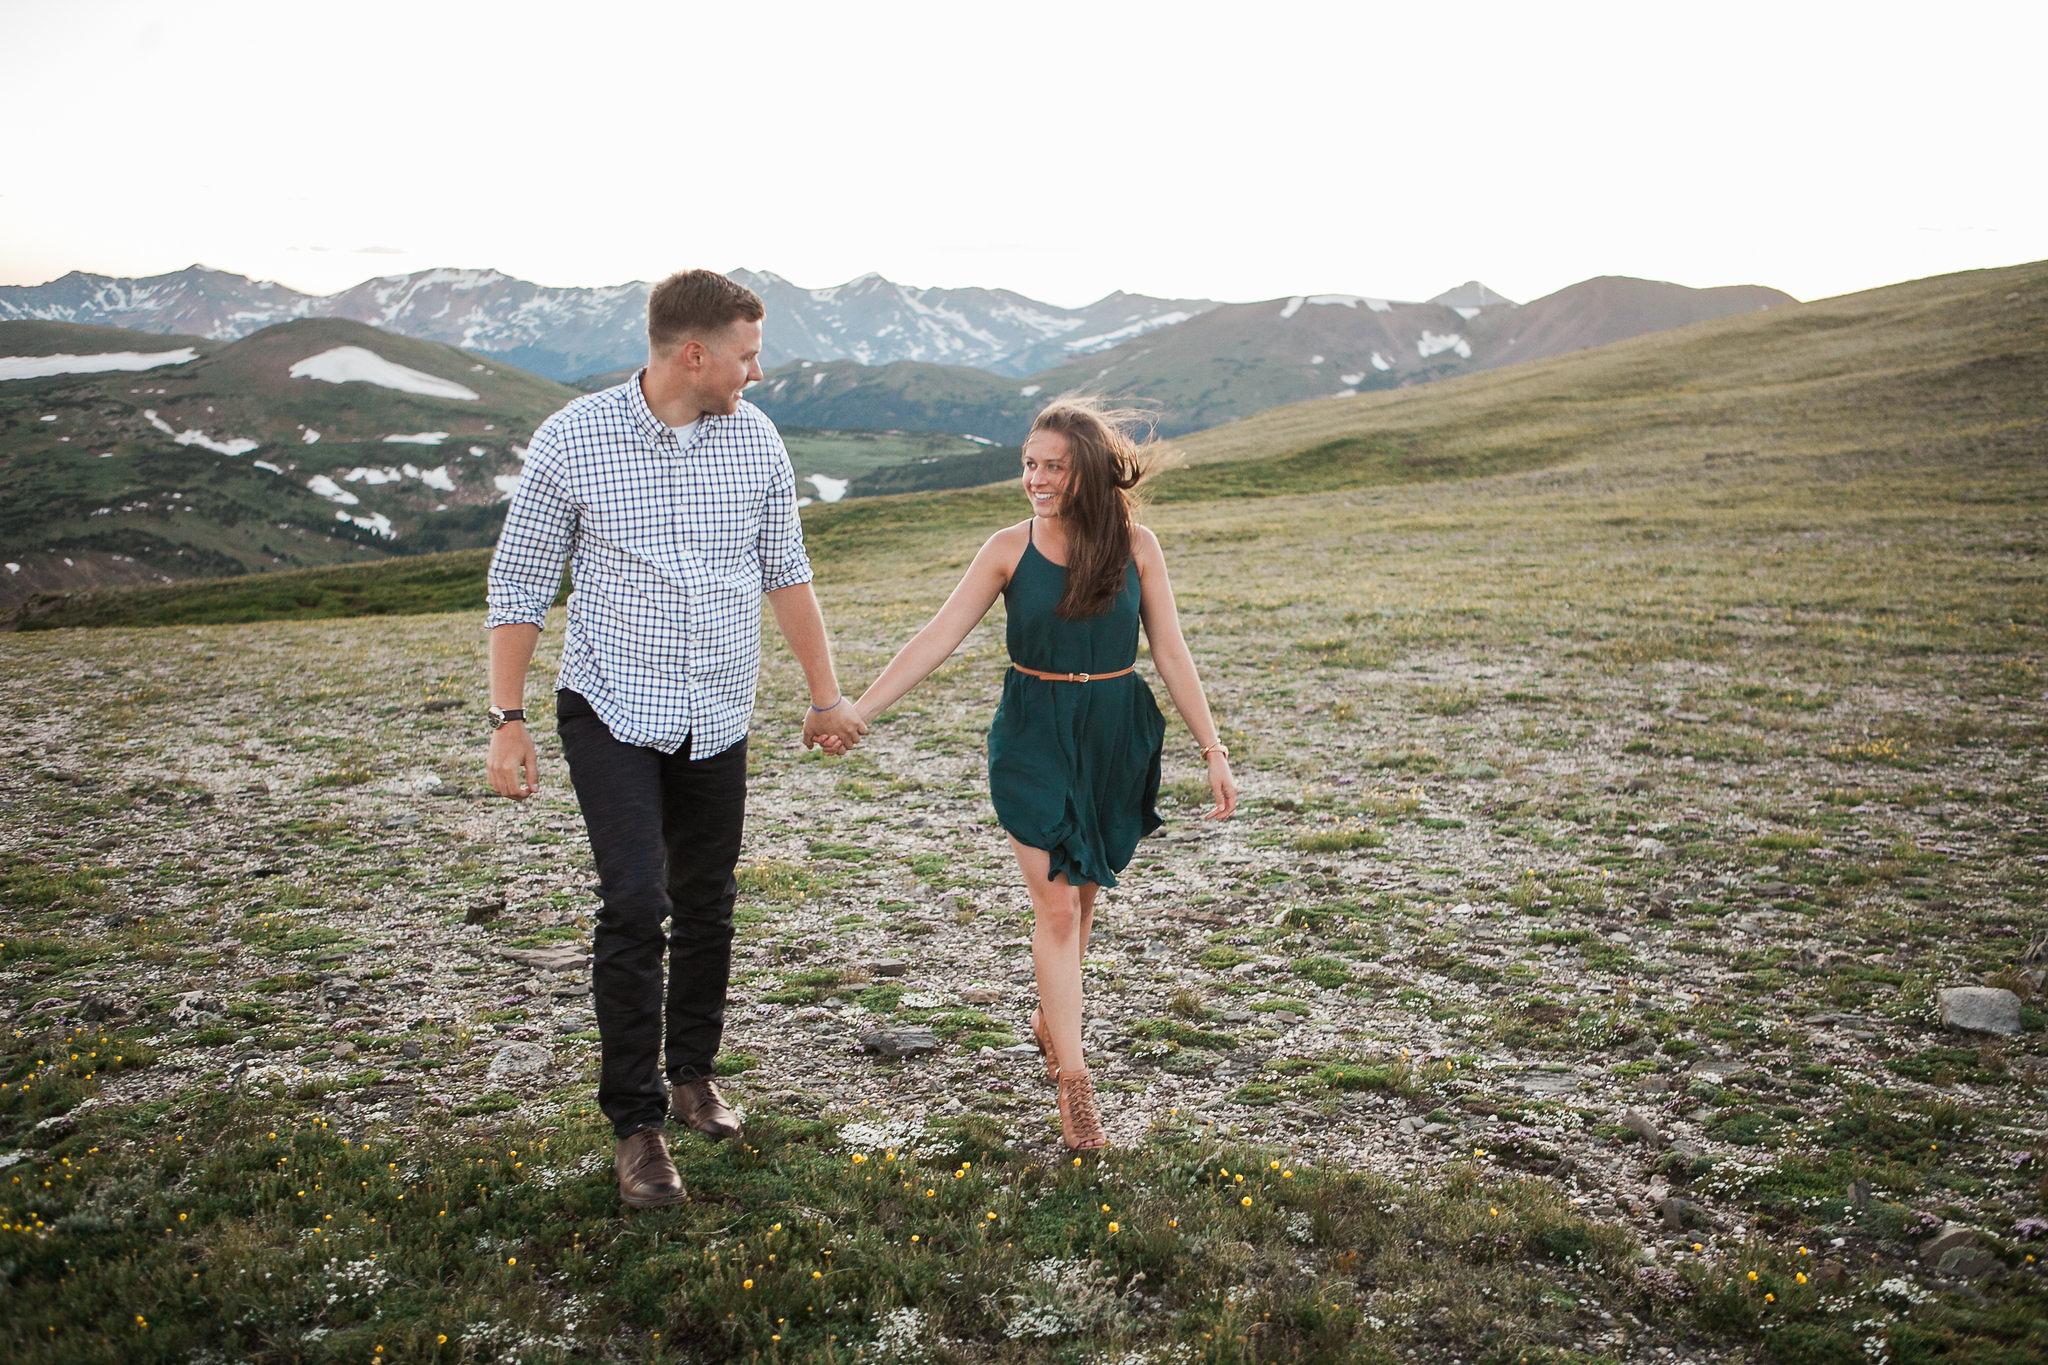 Rocky-Mountain-National-Park-engagement_053.jpg